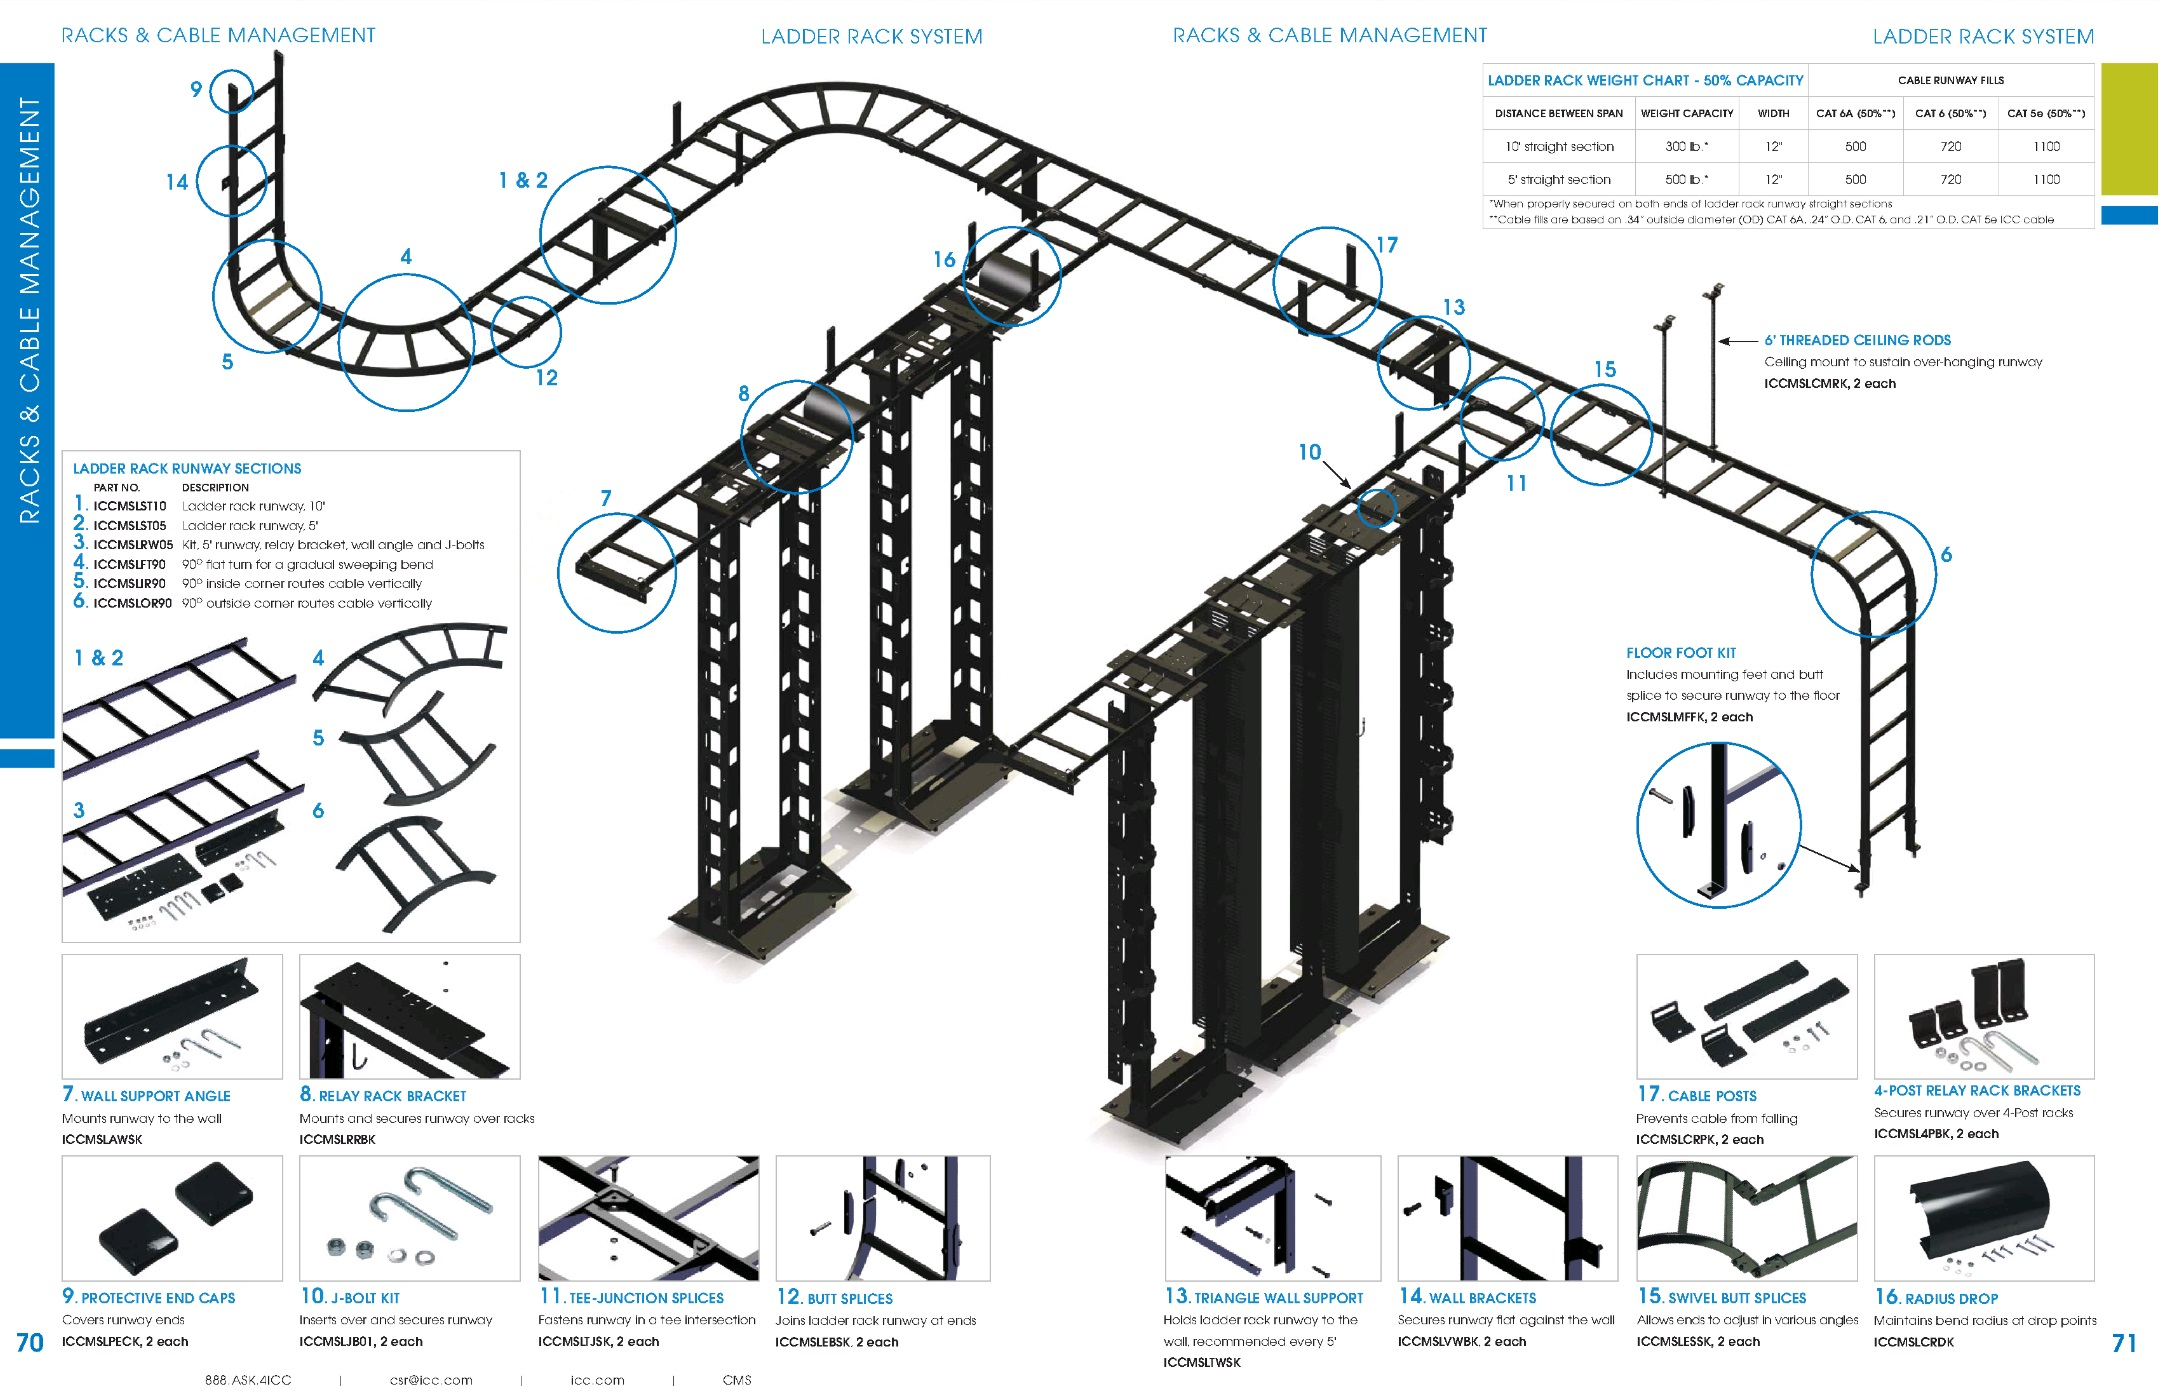 Ladder Rack Wire Managem Center Scr Time Delay Circuit Diagram Tradeoficcom Cable Management Racks Page 1 Cablemaster Com Rh